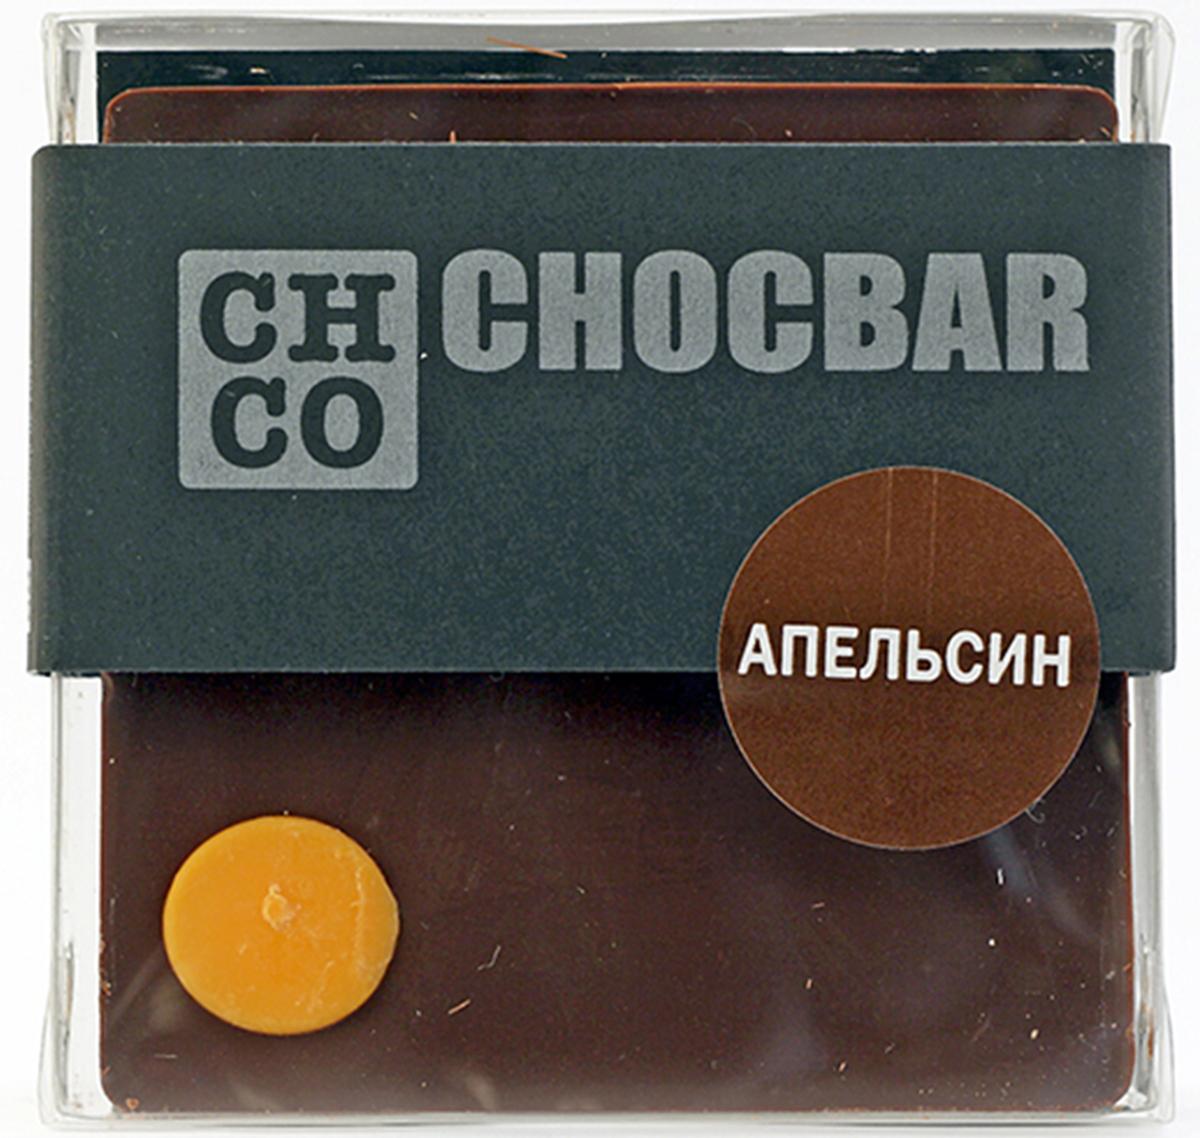 Chco Chocbar Dark Апельсин темный шоколад, 60 г ростагроэкспорт желе апельсин 125 г